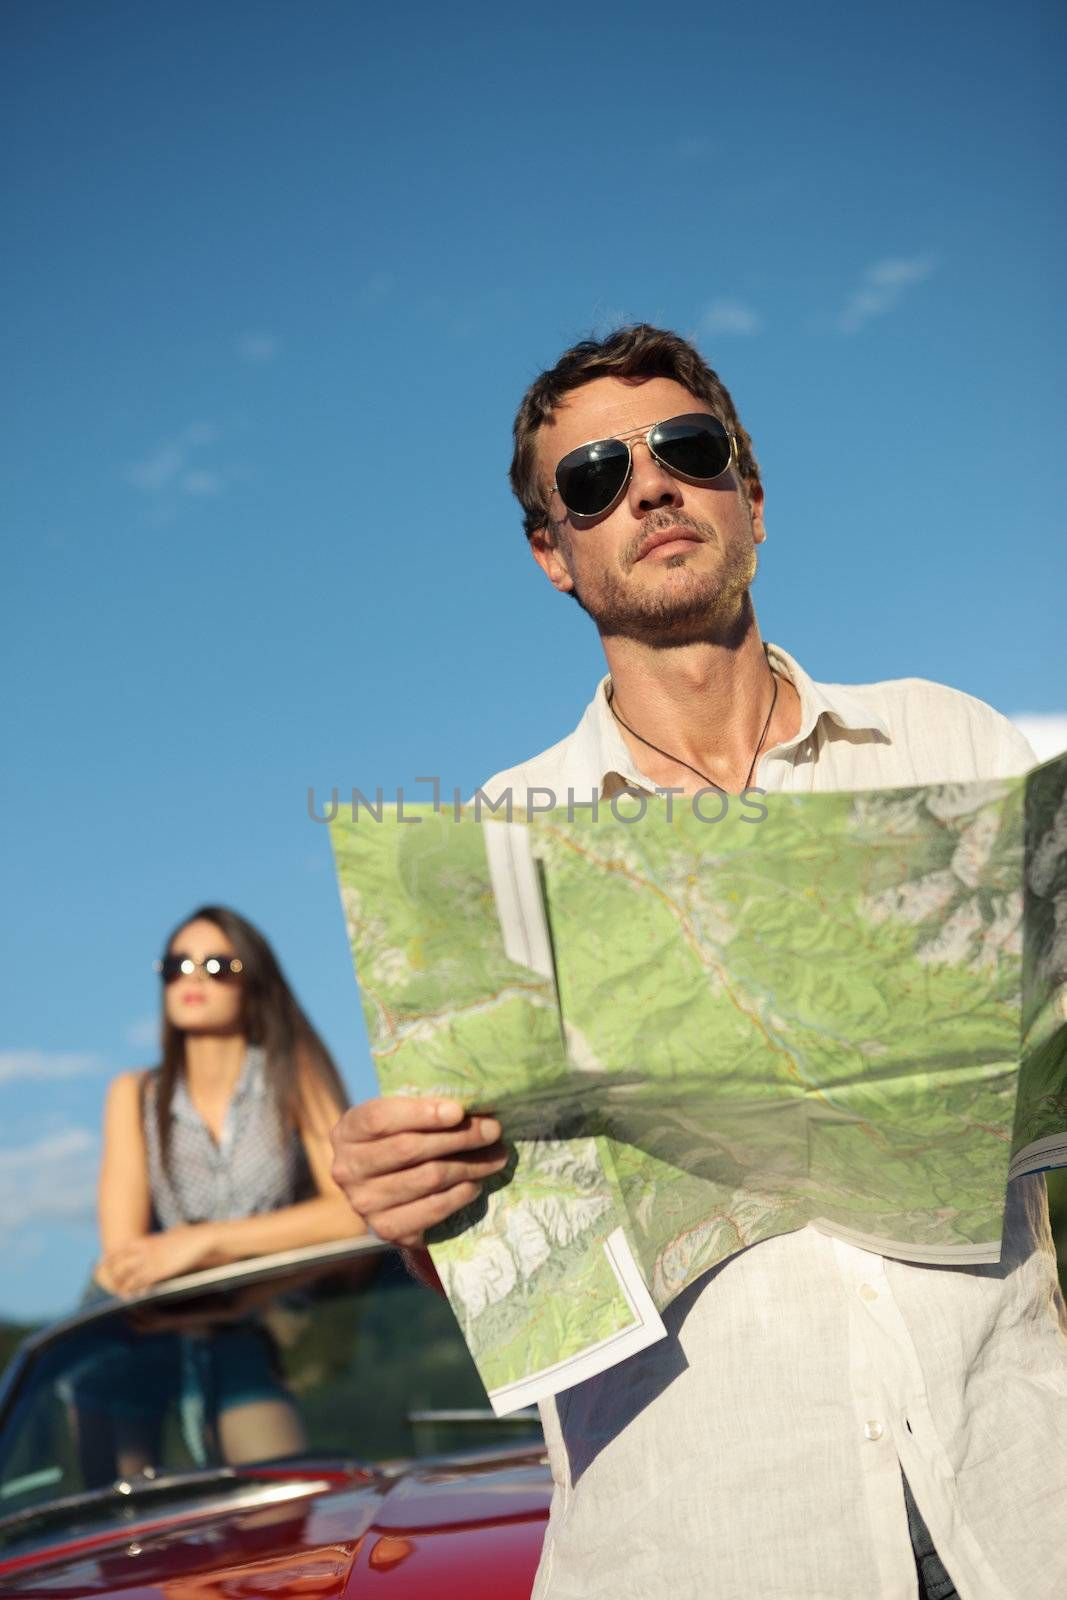 Travel destination by stokkete